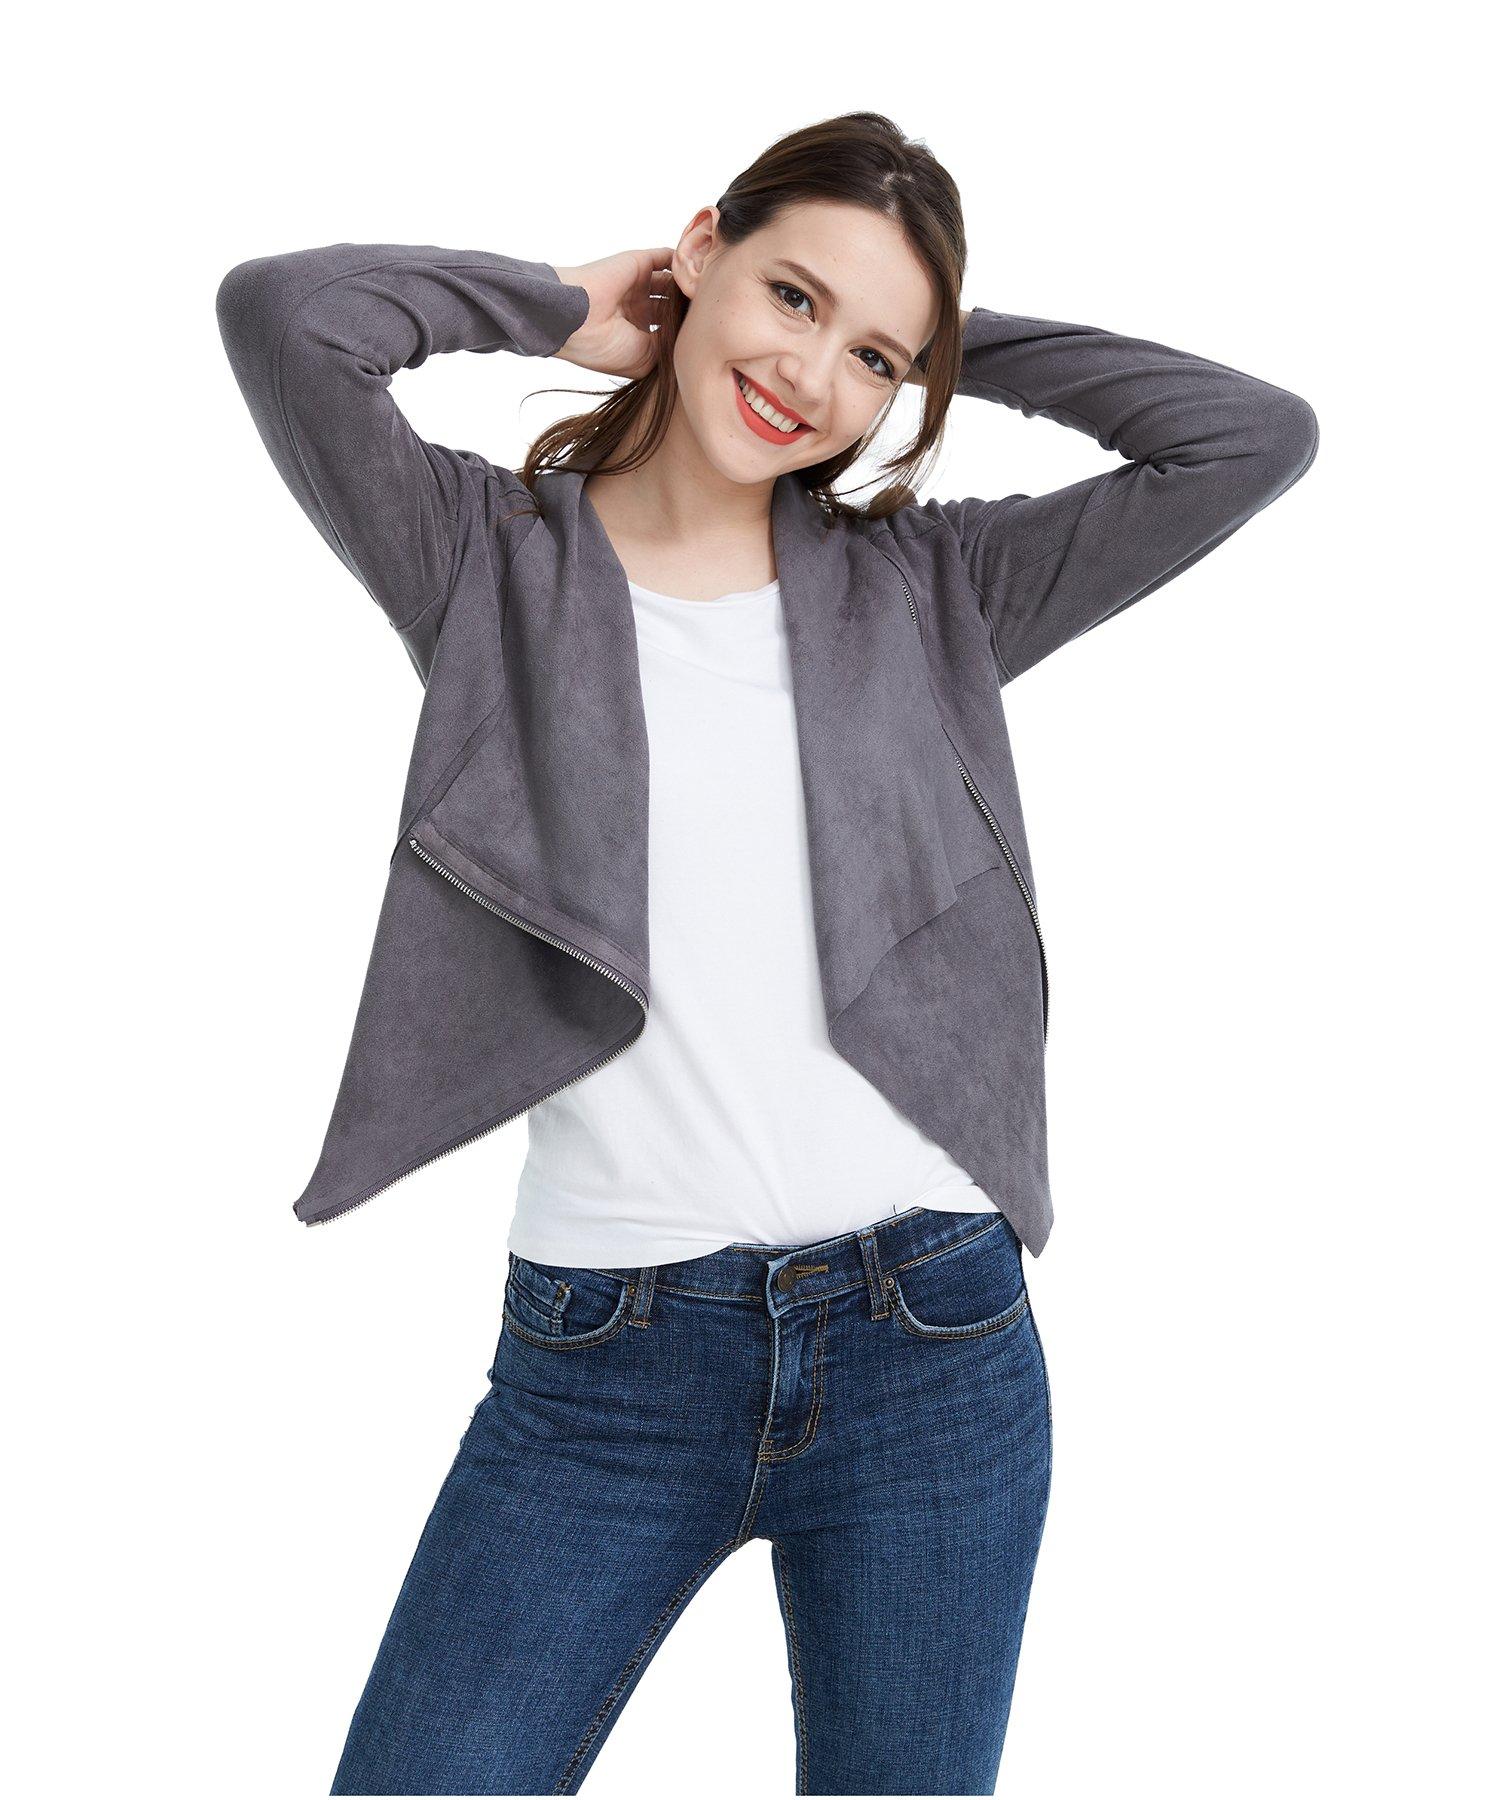 Fasbric Women Spring Autumn Lightweight Jackets Suede Zipper Solid Coat Tops Outwear-Grey-S